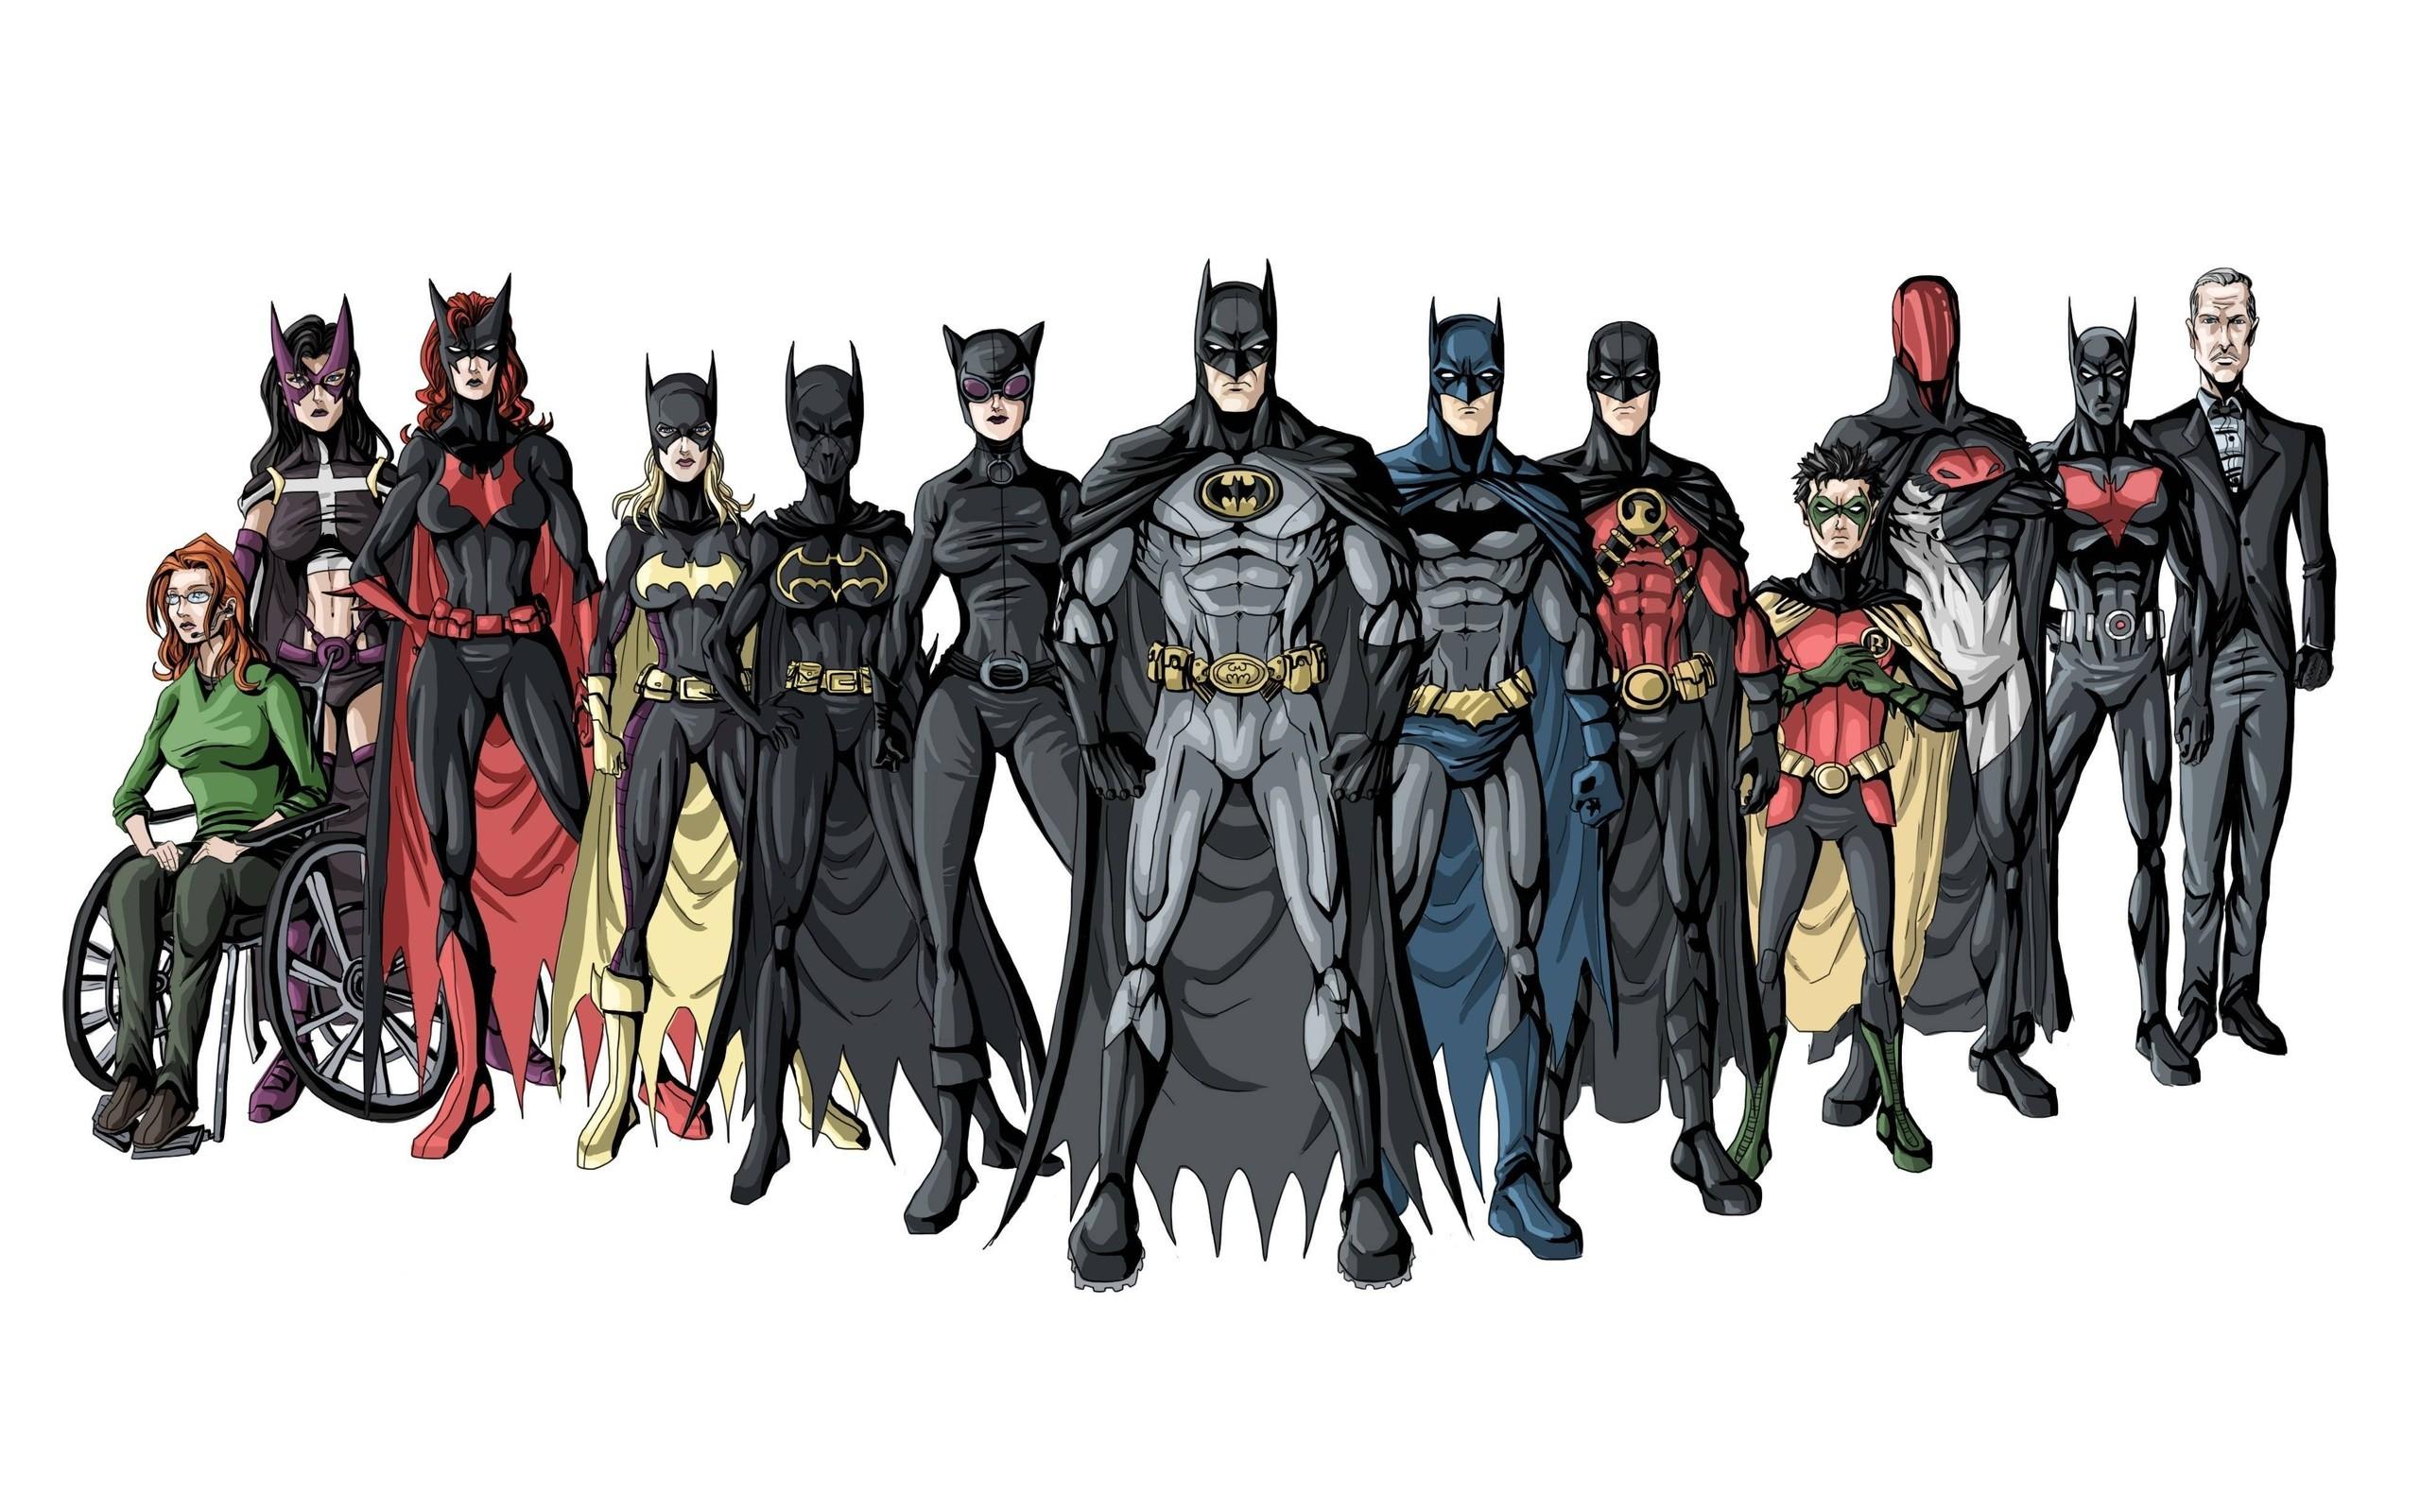 wallpaper.wiki-Comic-Nightwing-HD-Photos-Download-PIC-